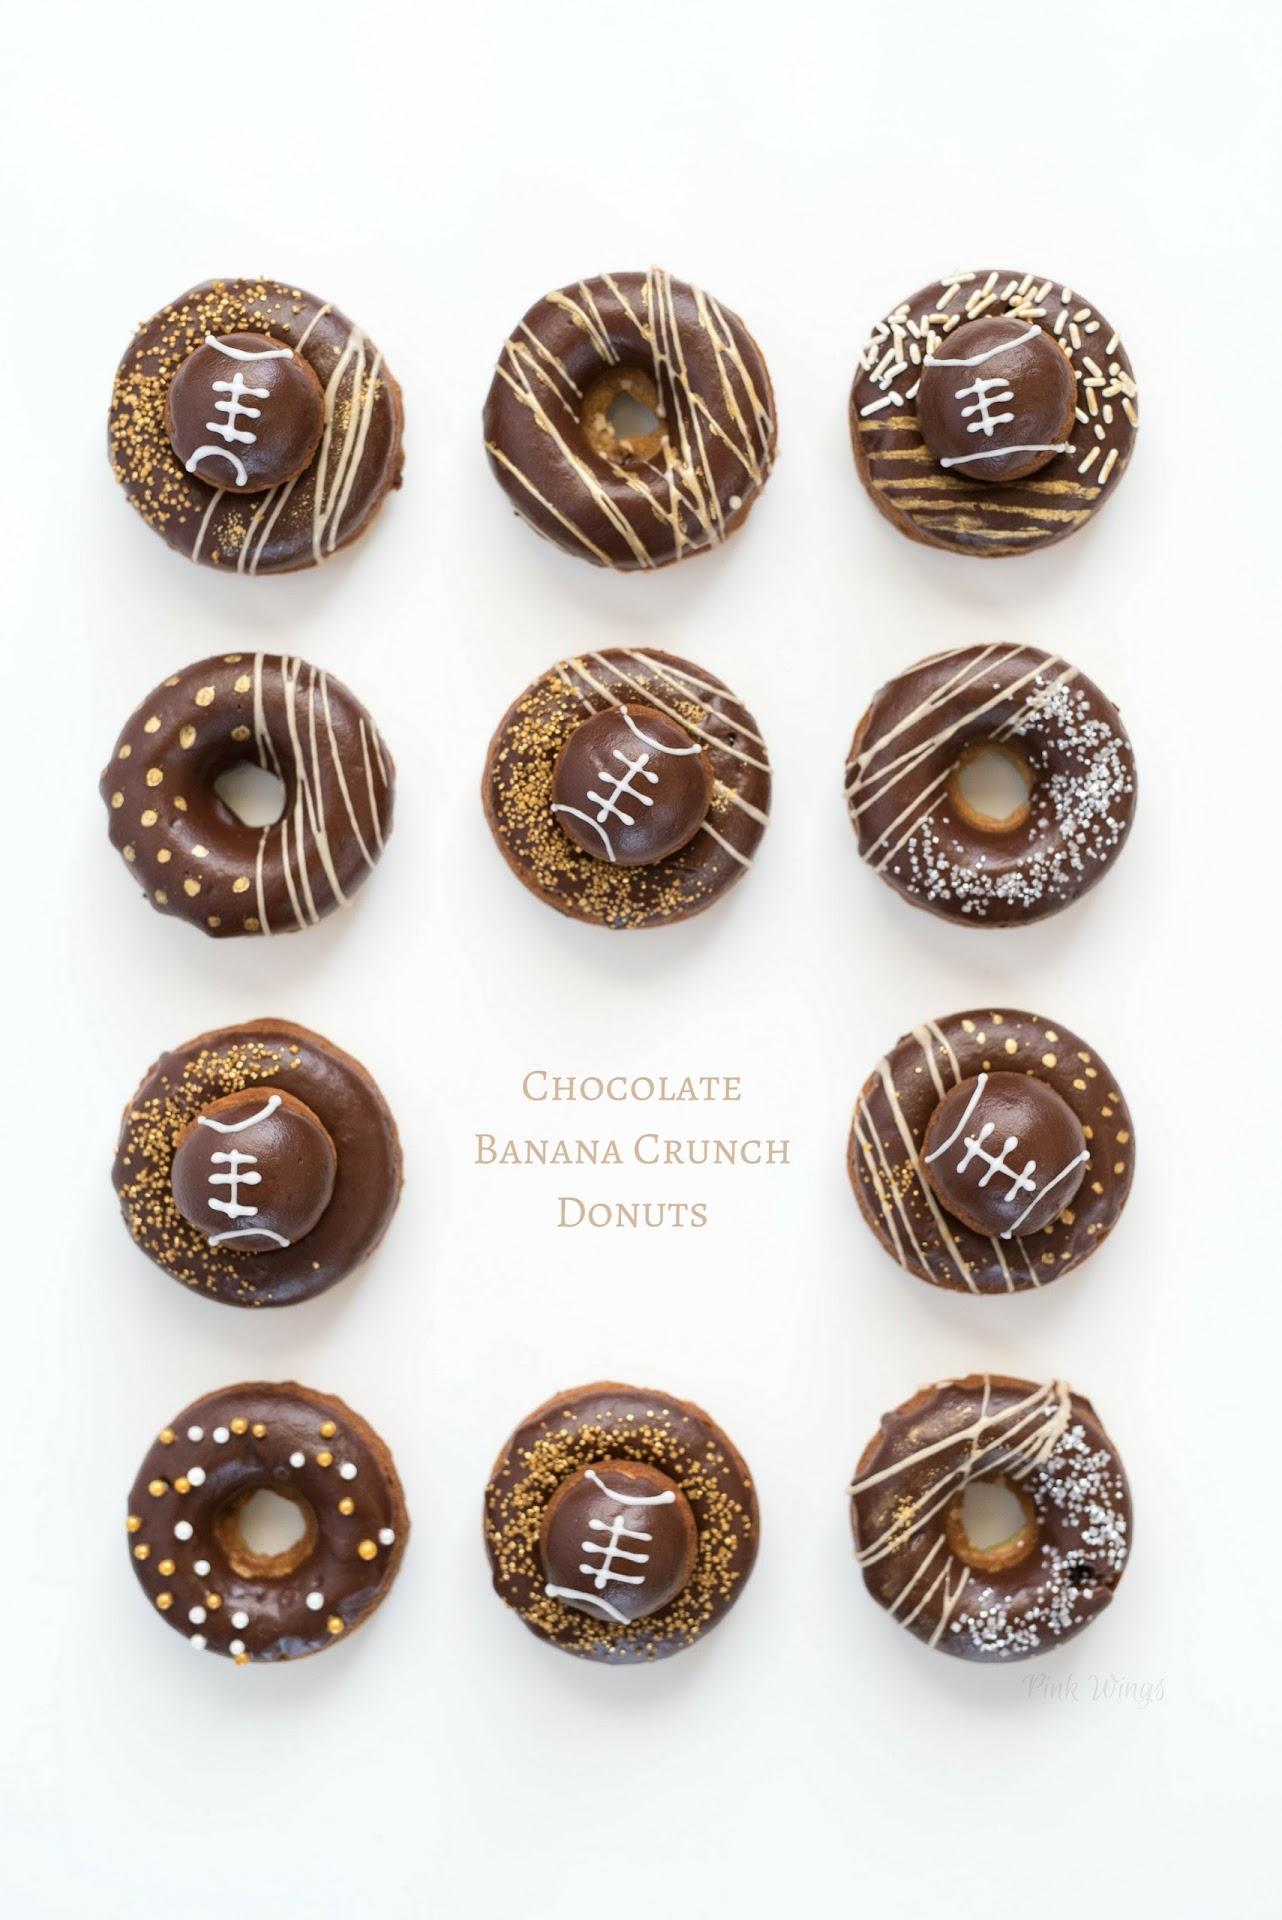 baked donut recipe, chocolate doughnuts, football dessert recipe, football party ideas, football doughnuts, gold doughnuts, gold desserts, gold party ideas, banana dessert, tailgating, unique football food